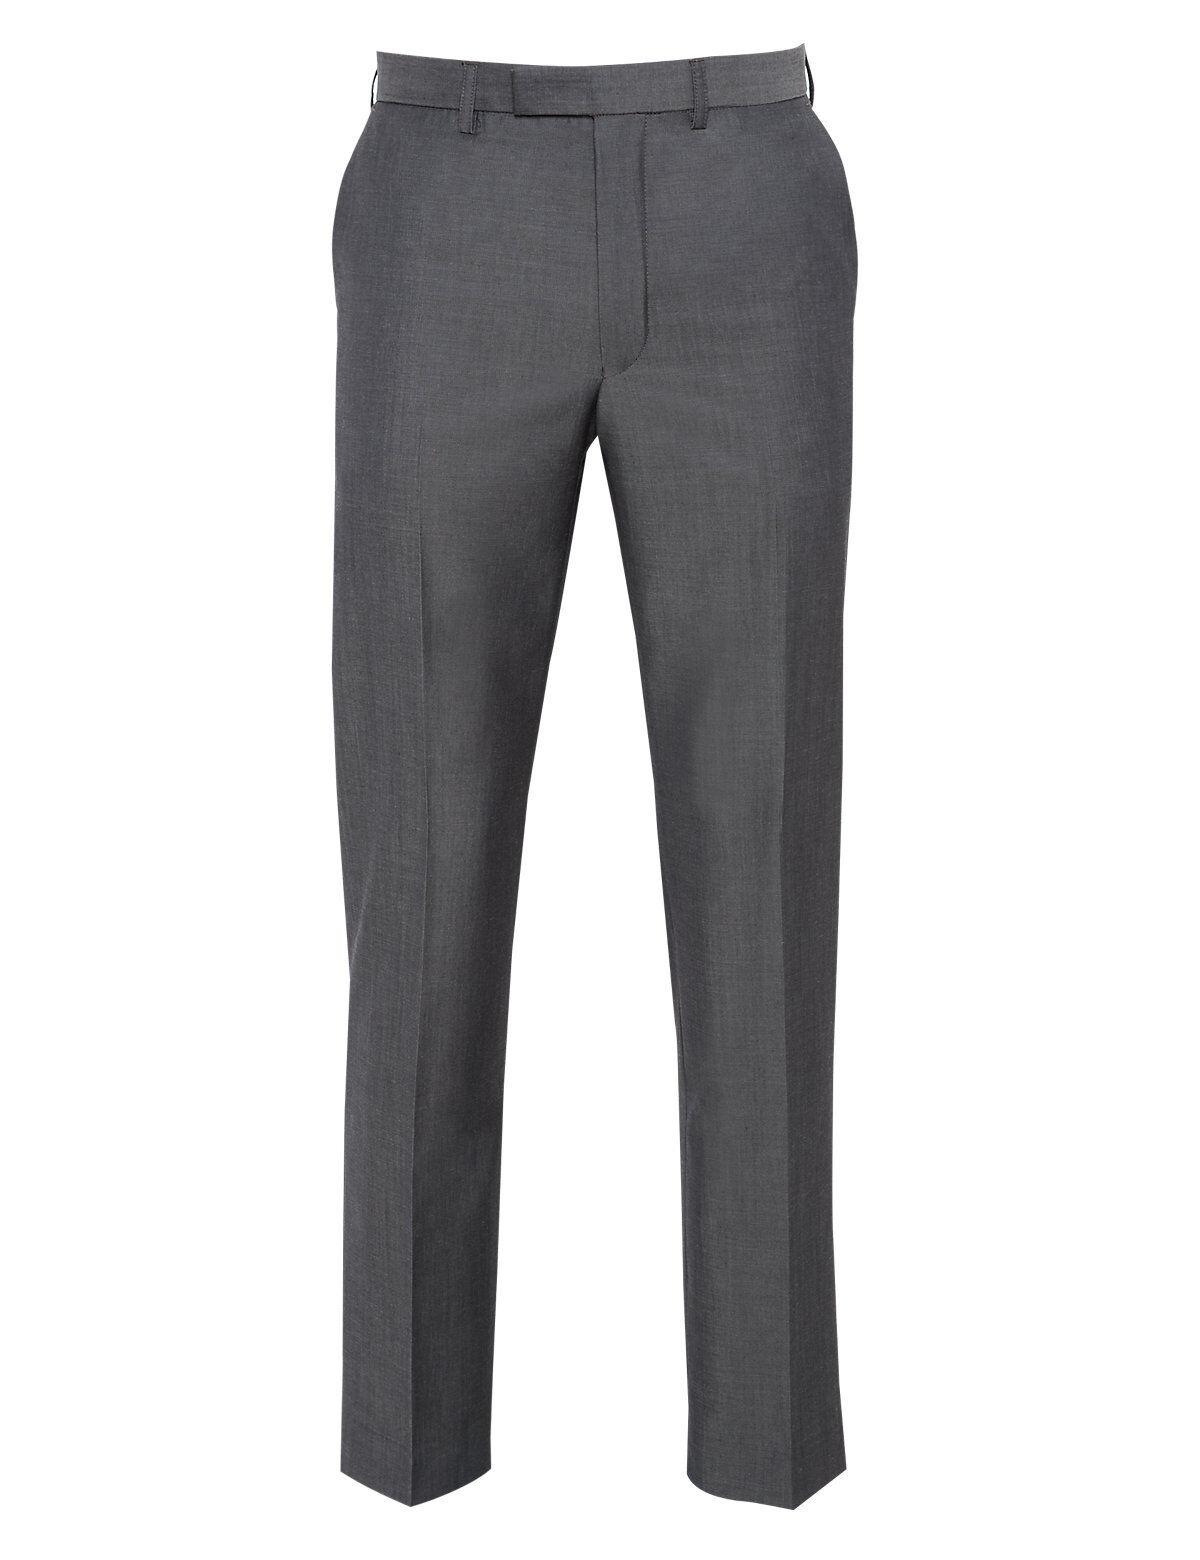 New M&S M&S M&S Autograph grau Wool Blend TailGoldt Fit Suit Sz  36 L 38 L 40 L    | Die Farbe ist sehr auffällig  | Internationale Wahl  | Erste Gruppe von Kunden  b8293e